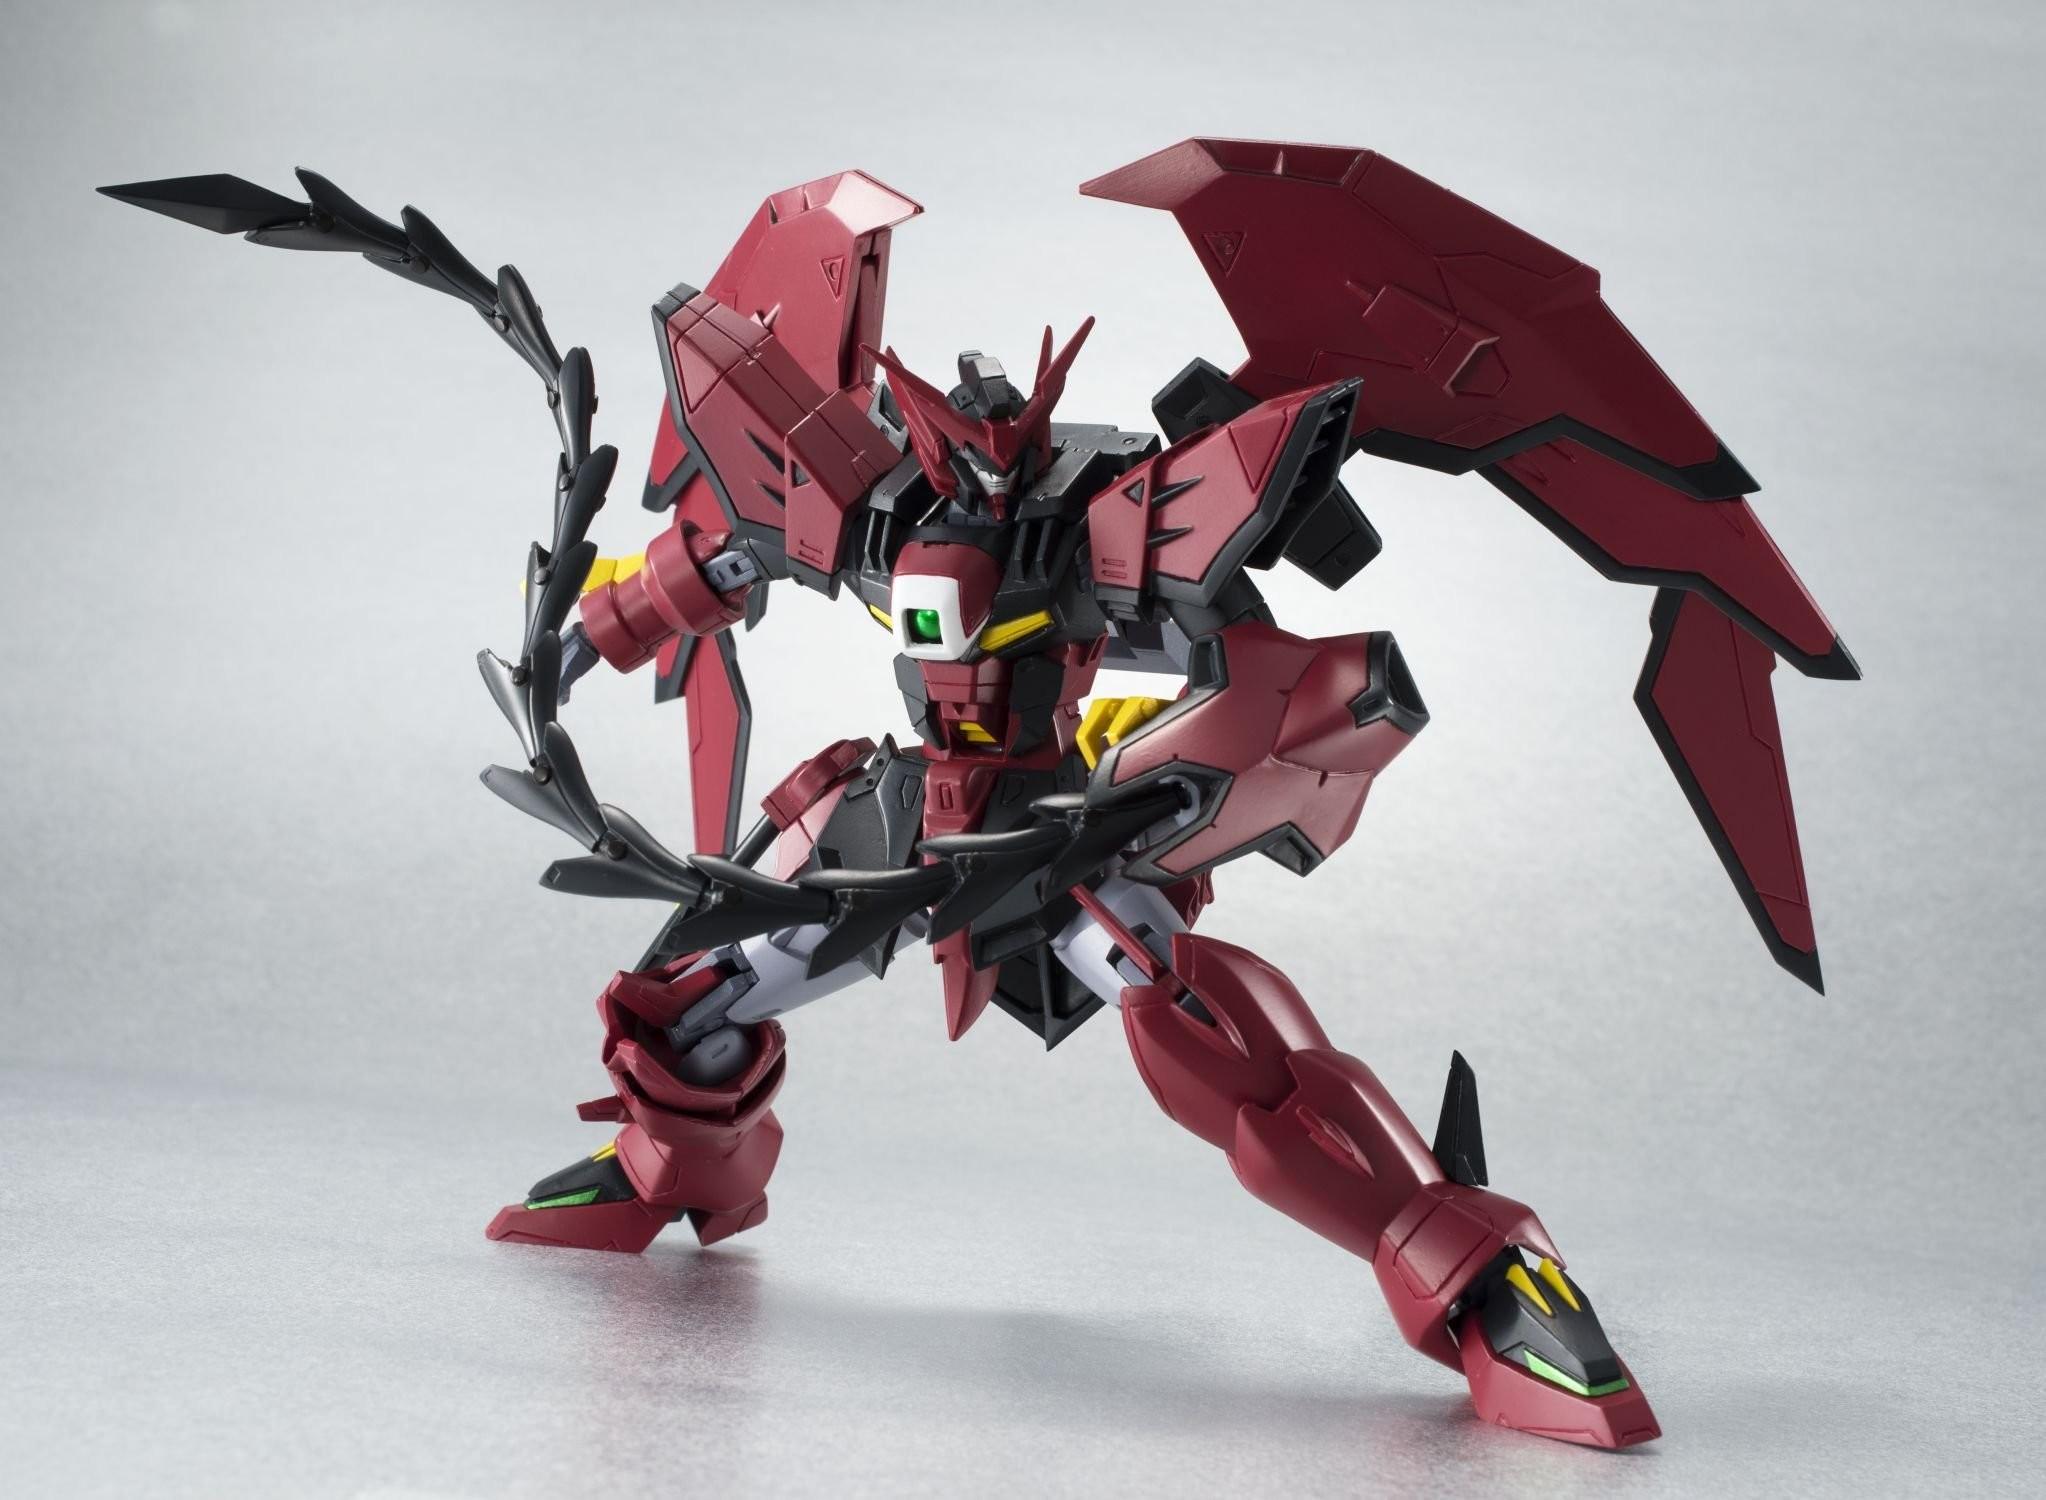 Kirin Hobby : Robot Spirits Gundam Wing: Gundam Epyon Action Figure by  Bandai 4543112781901